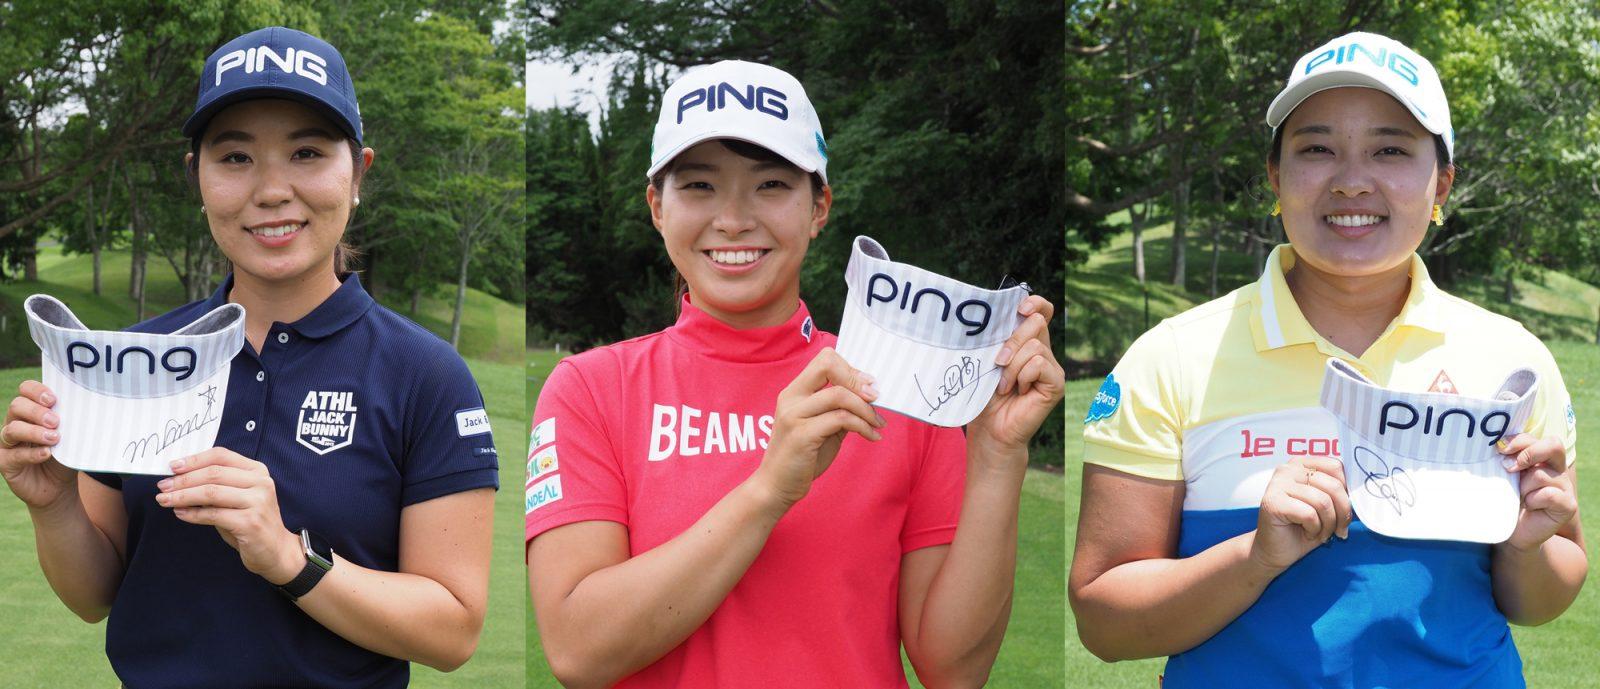 「#pingと一緒」にゴルフをエンジョイ!【豪華賞品が当たる投稿キャンペーン実施中】Regina(レジーナ) | Regina(レジーナ)